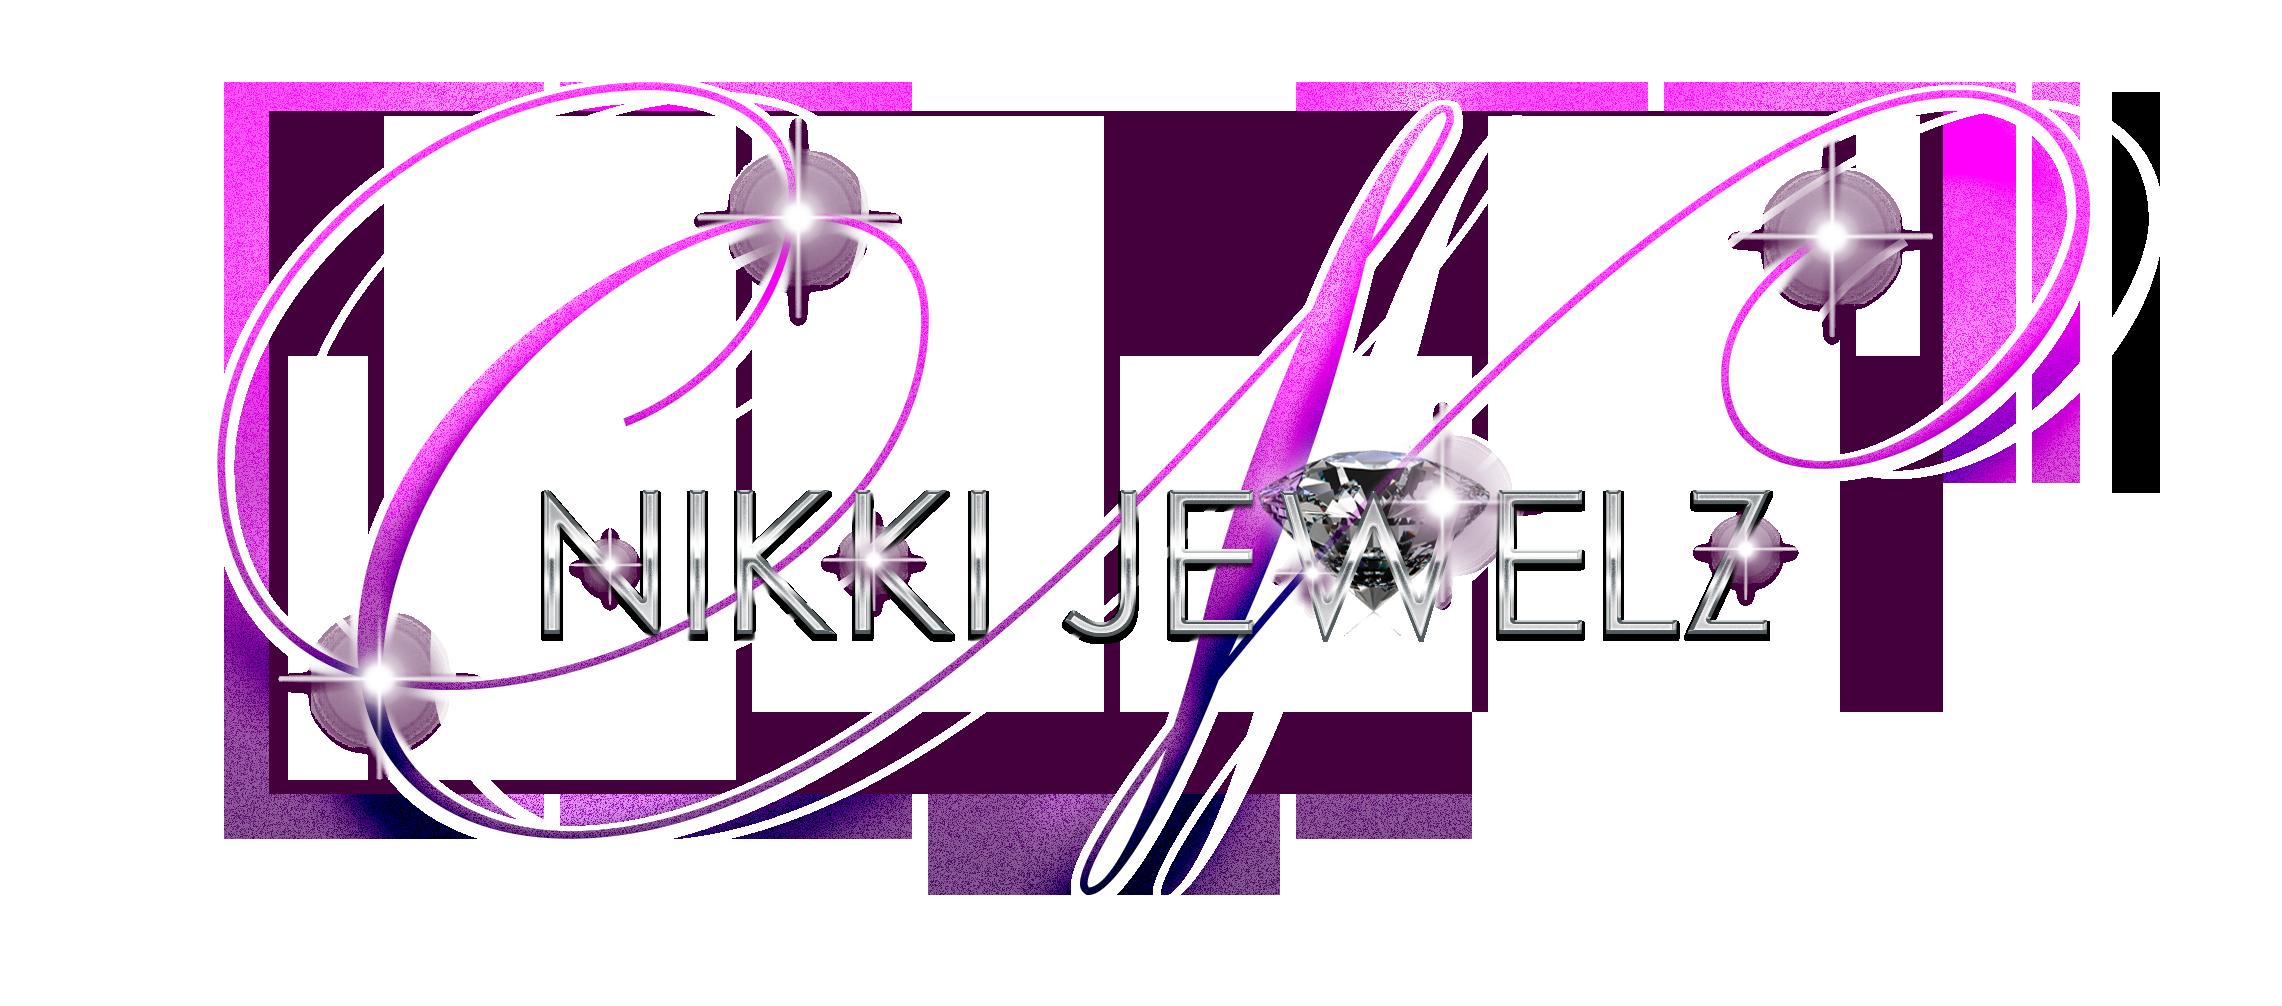 Nikki Jewelz